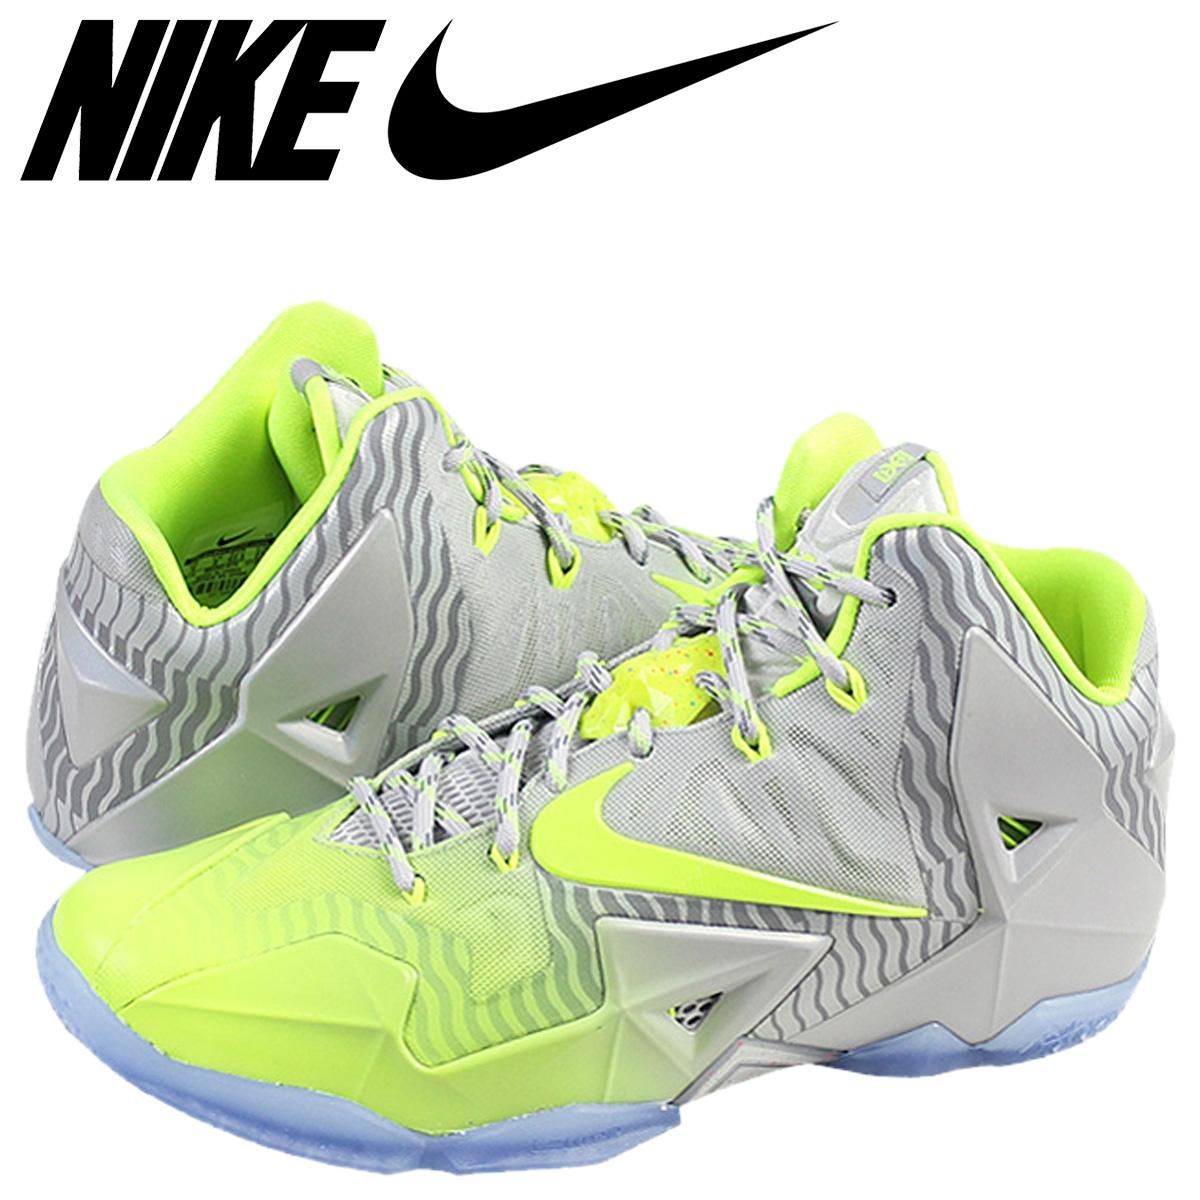 online retailer b1d47 6f09b NIKE Nike LeBron sneakers LEBRON 11 MAISON LEBRON COLLECTION LeBron 11  683252-074 men's shoes grey